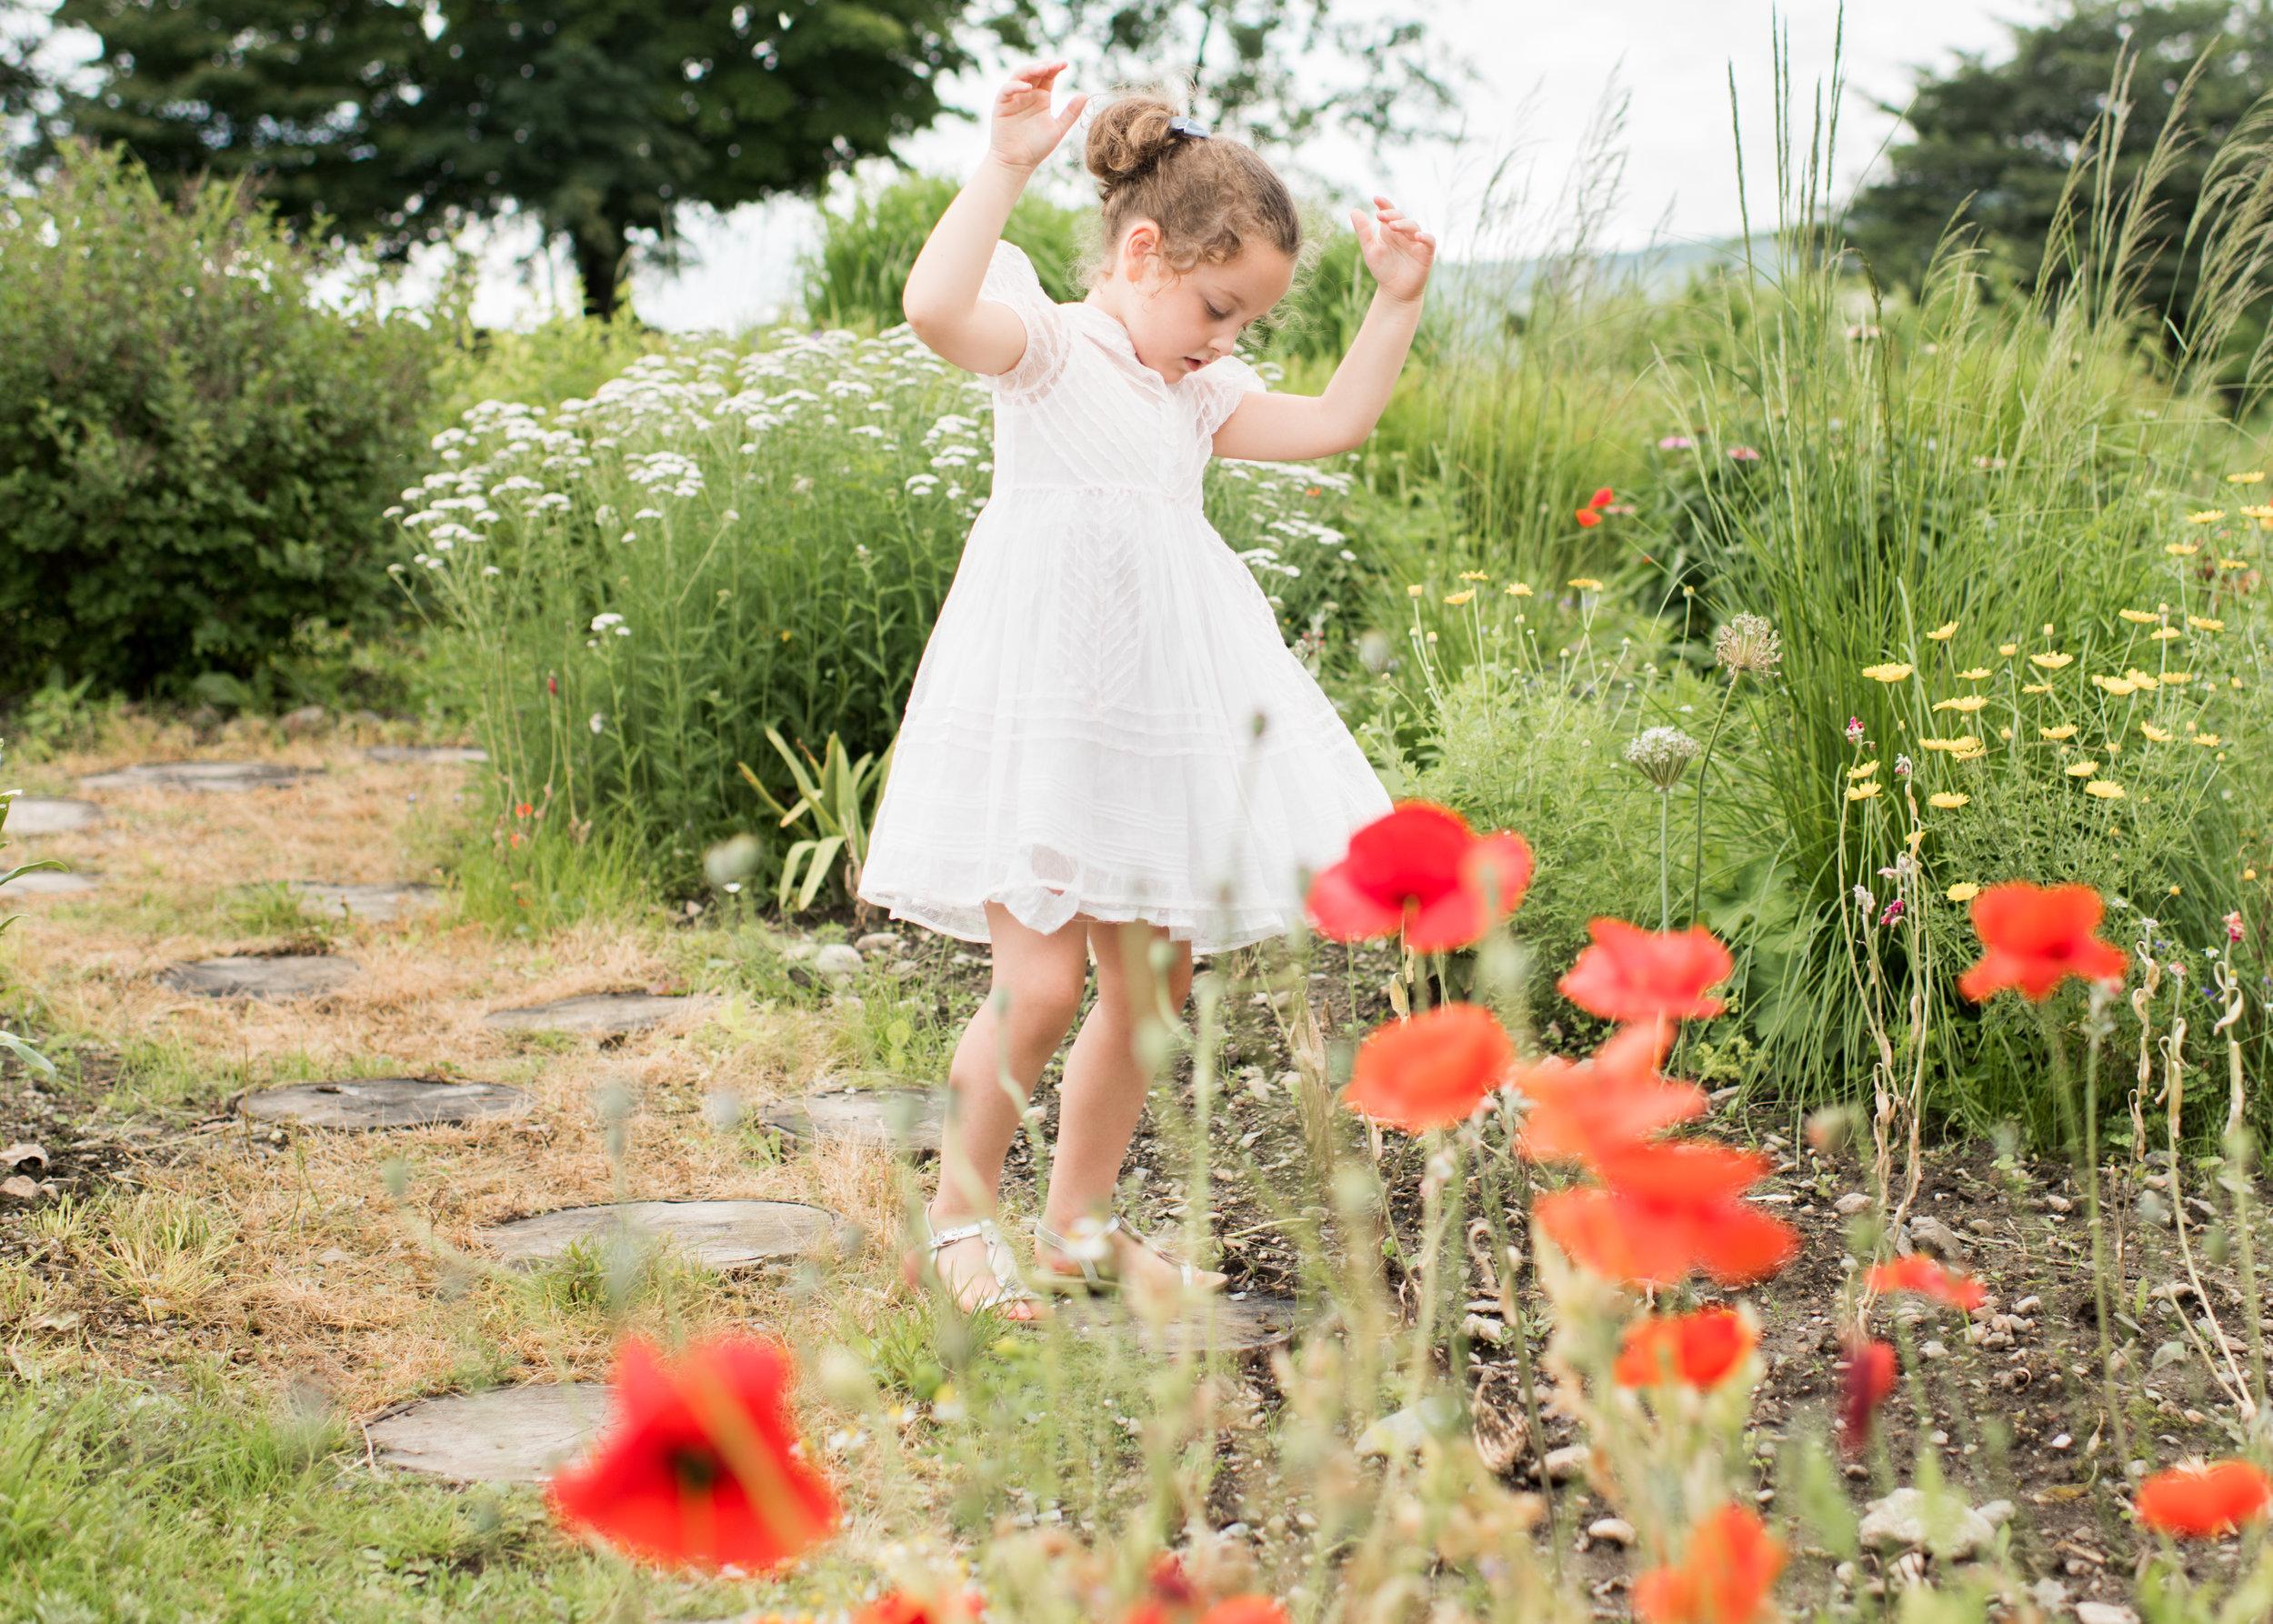 Blog_Jessica Dickinson_Skipping Stones_Image 26.jpg